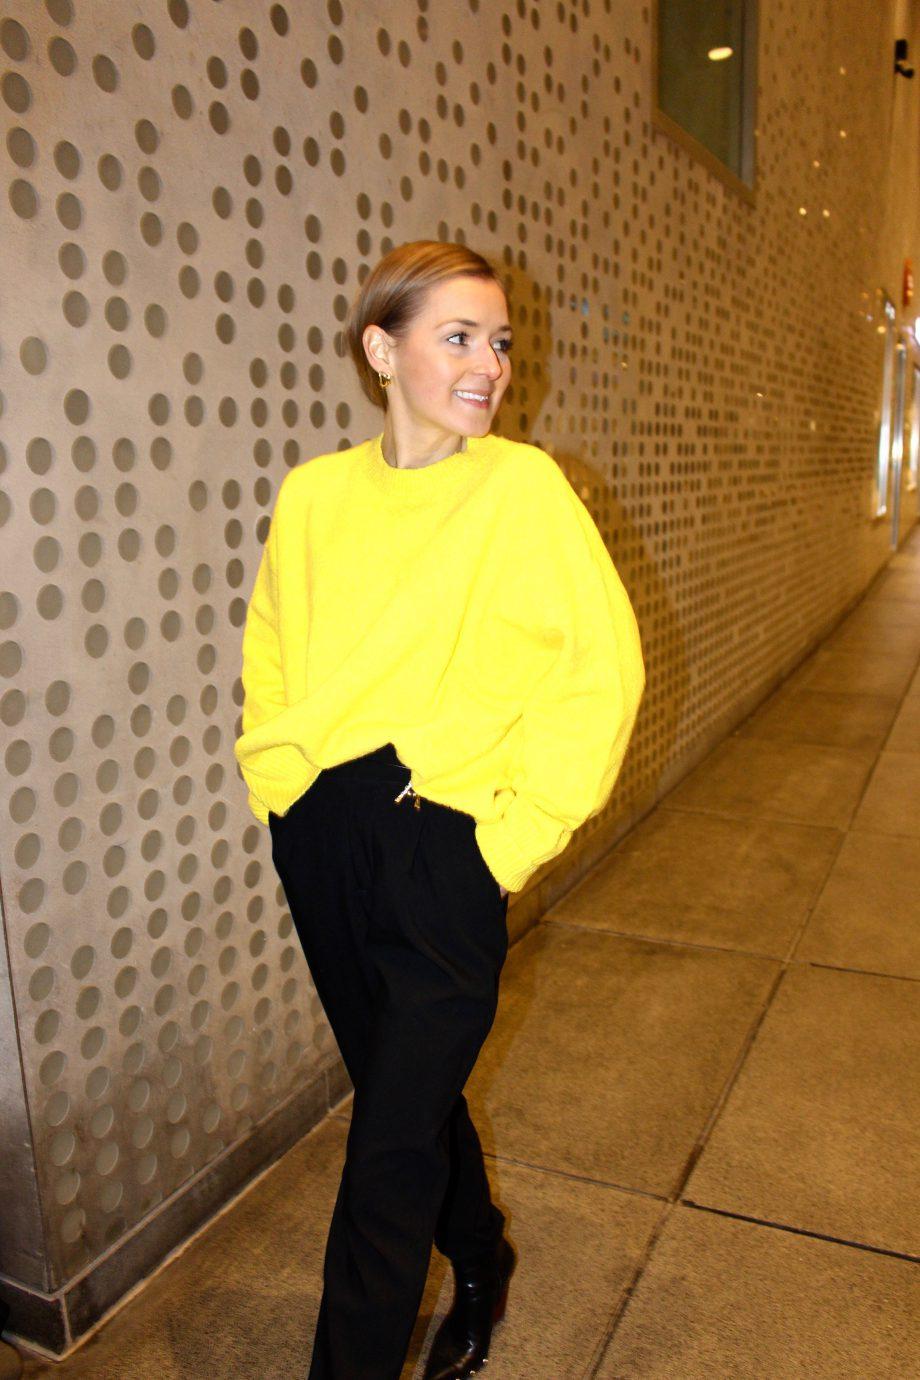 The Yellow Sweater |17.12.2018